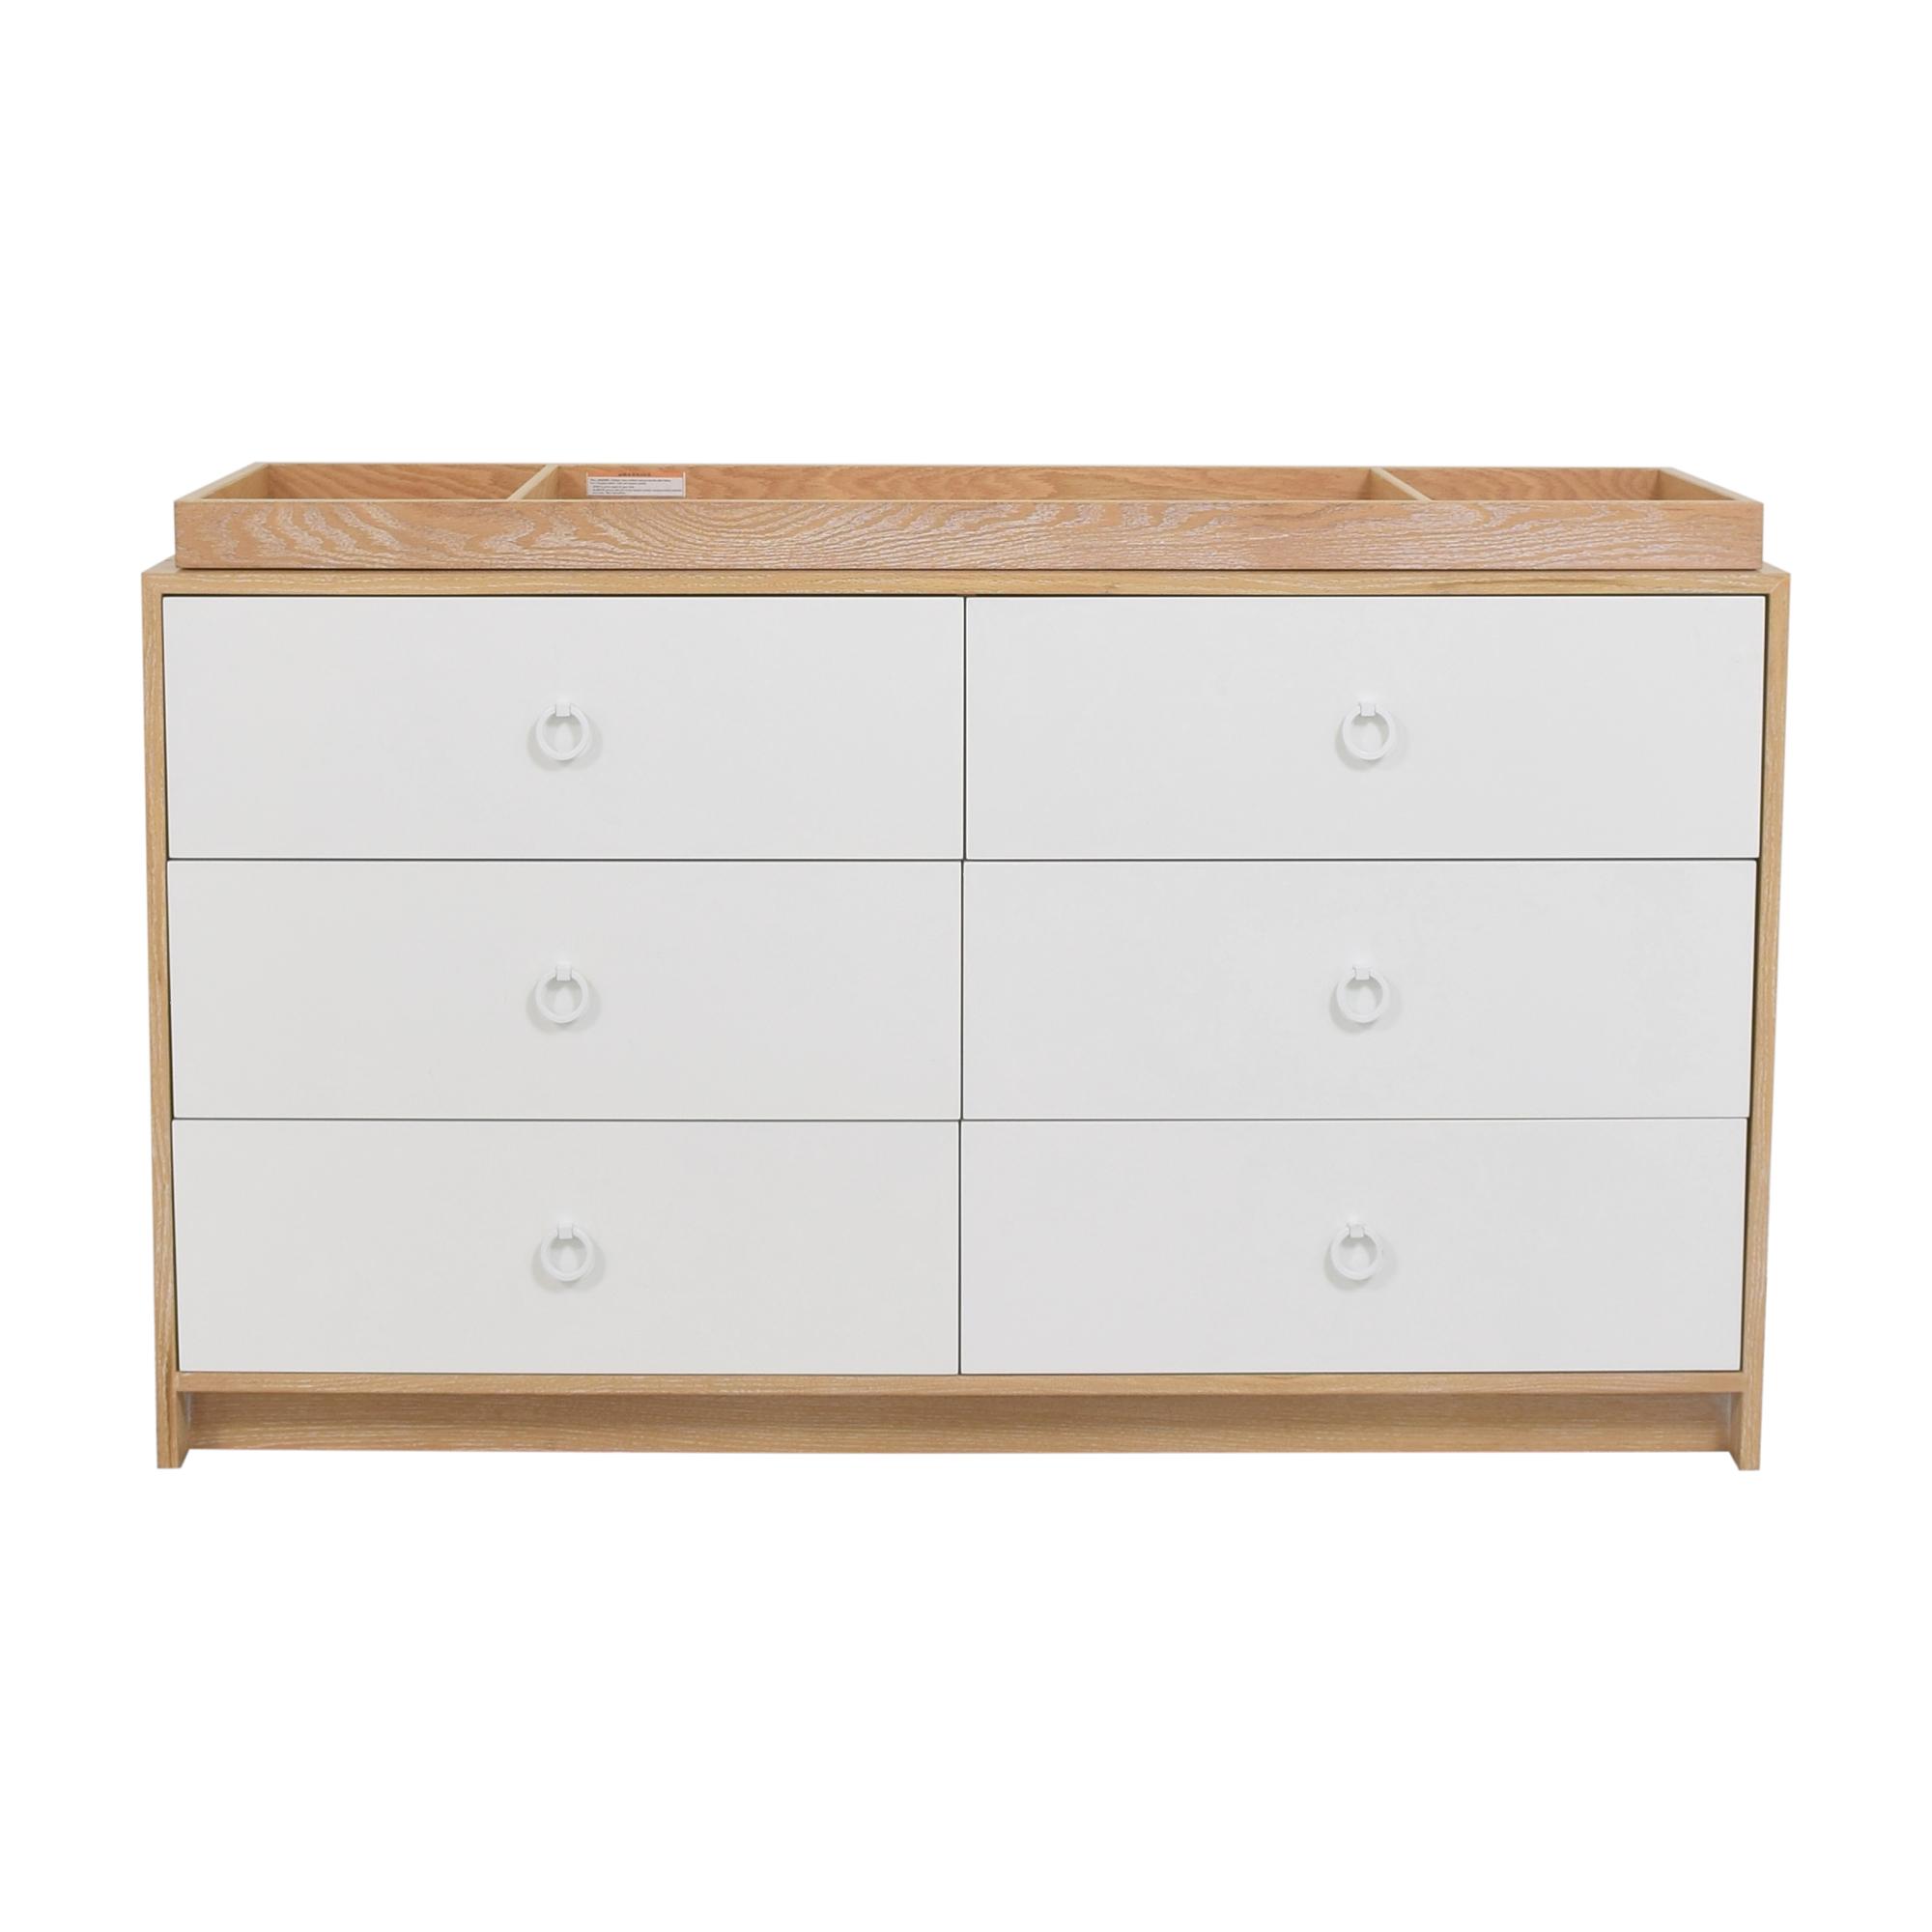 ducduc ducduc Cabana Doublewide Six Drawer Dresser